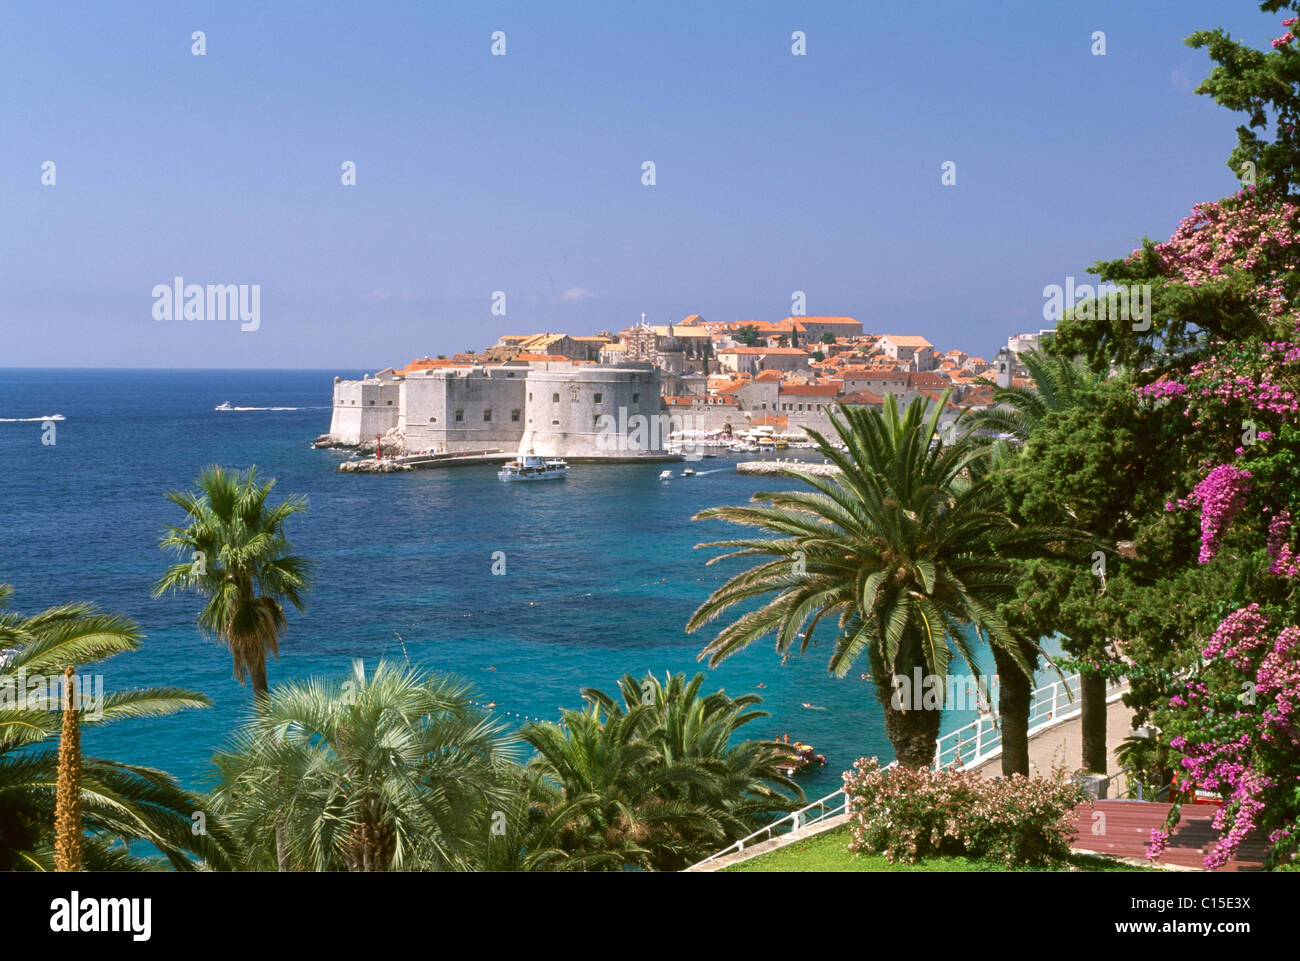 Dubrovnik, Dalmatia, Dalmatian Coast, Croatia - Stock Image